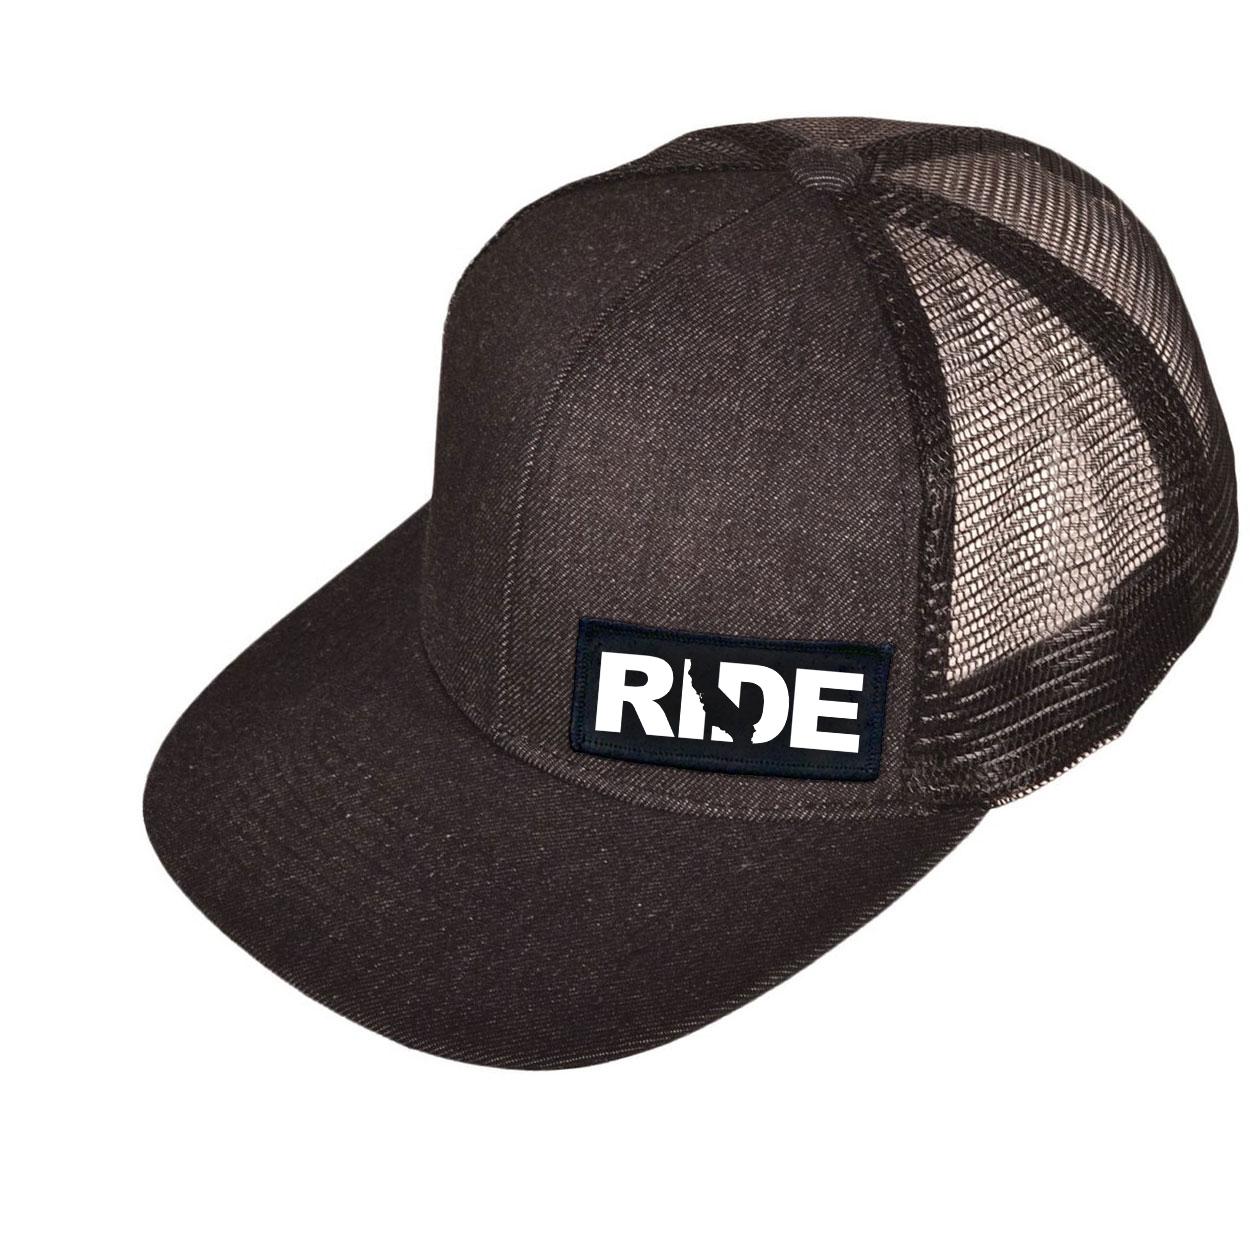 Ride California Night Out Woven Patch Snapback Flat Brim Hat Black Denim (White Logo)